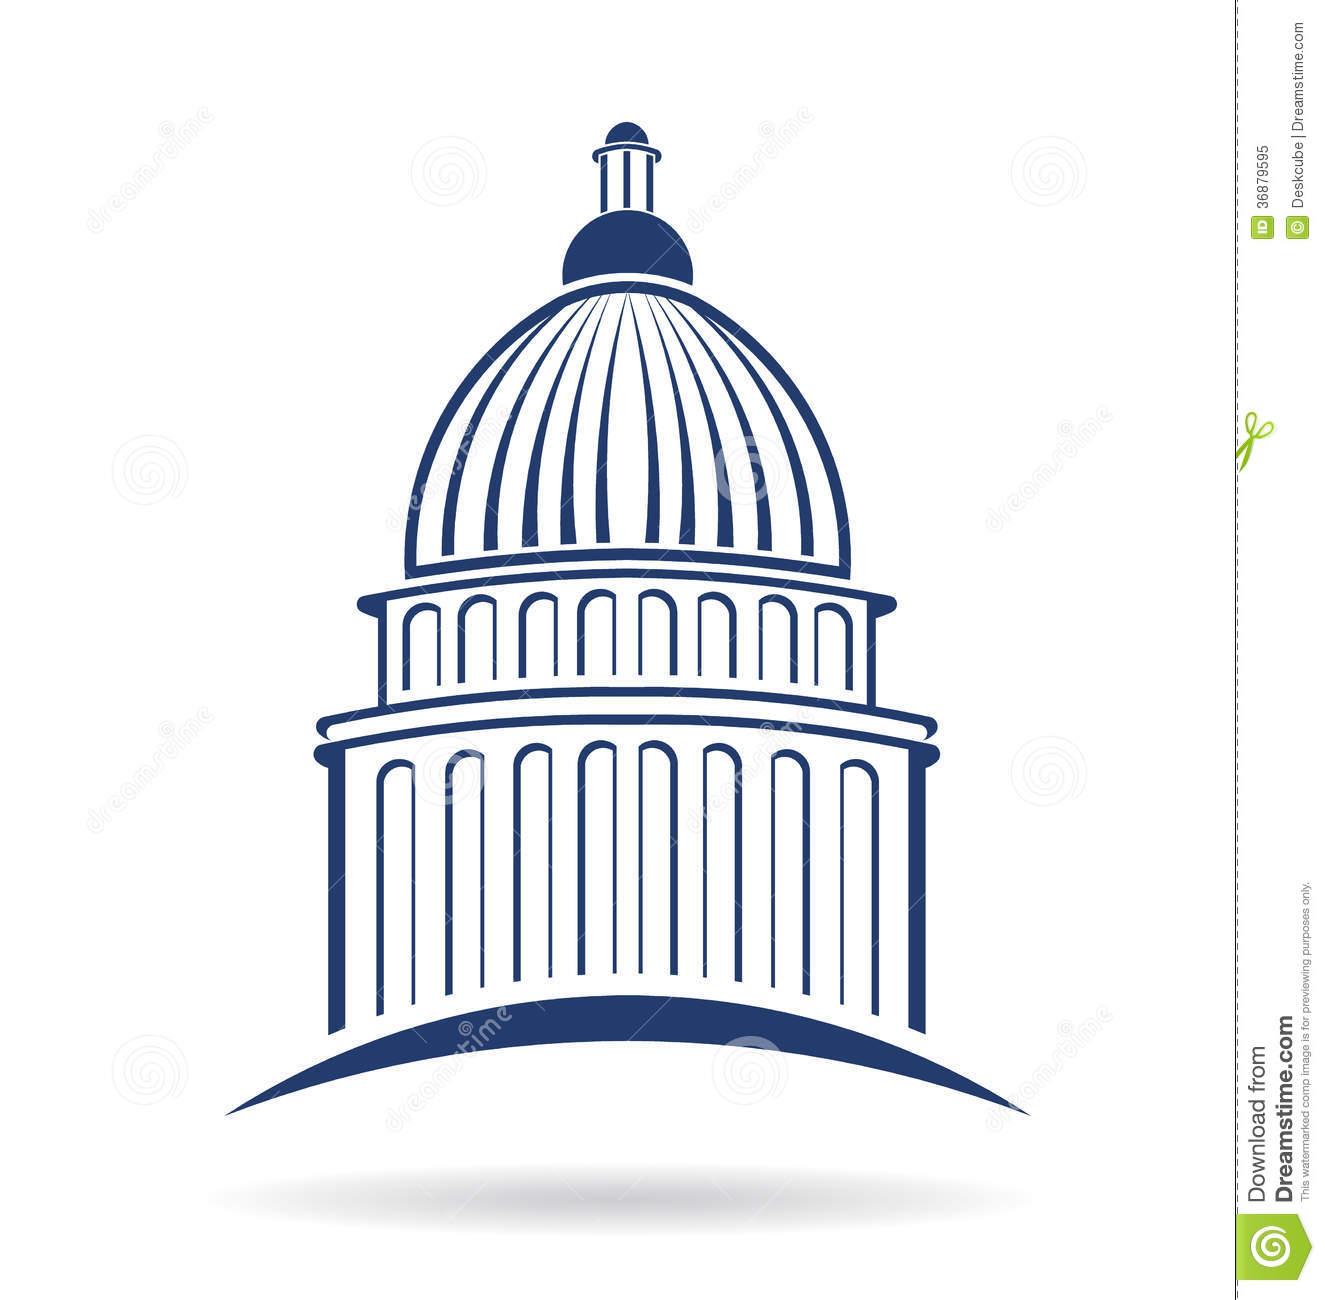 U S Capitol Dome Clipart-U S Capitol Dome Clipart-16